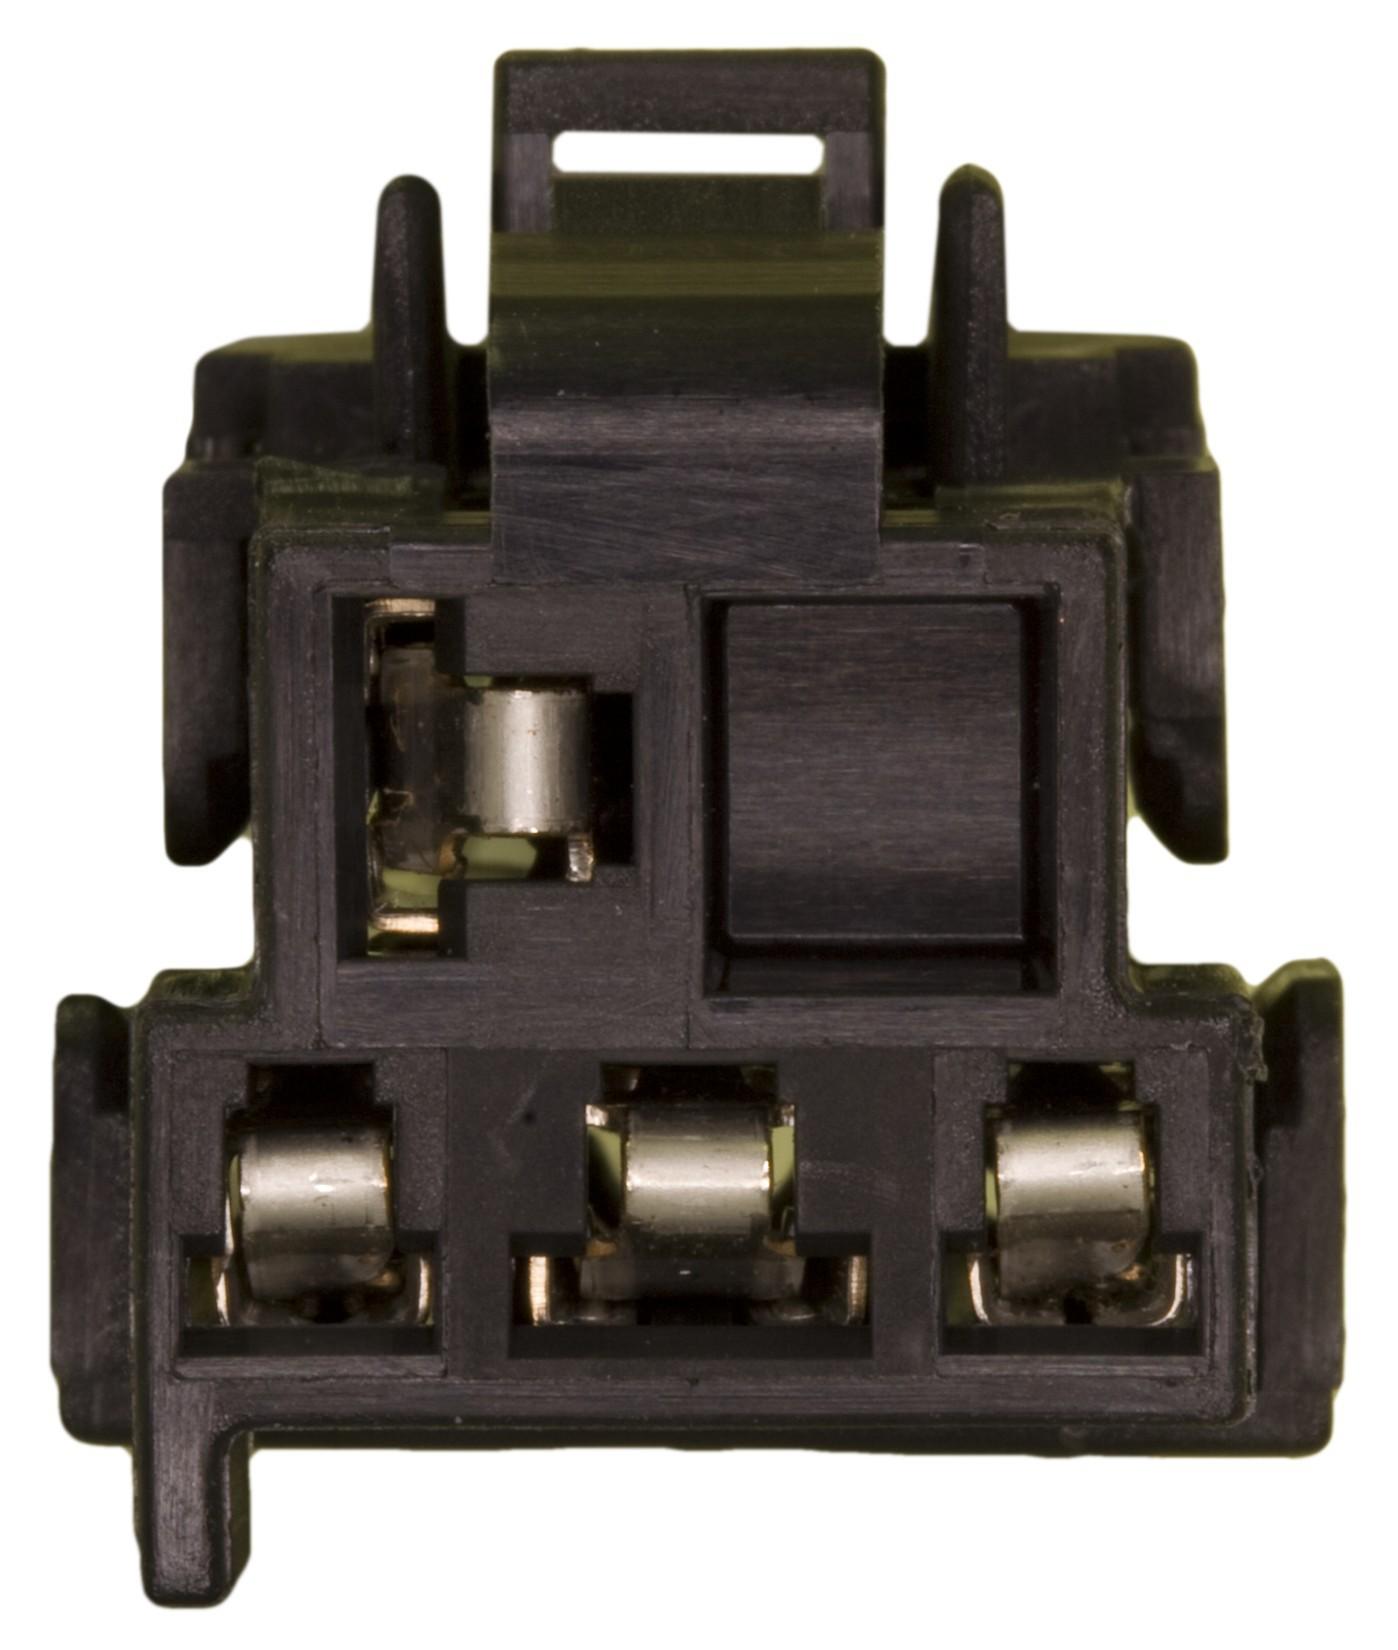 AIRTEX ENG MGMT SYSTEMS(DELETE V24A01R1) - Fuel Pump Relay Connector - AEM 1P1566